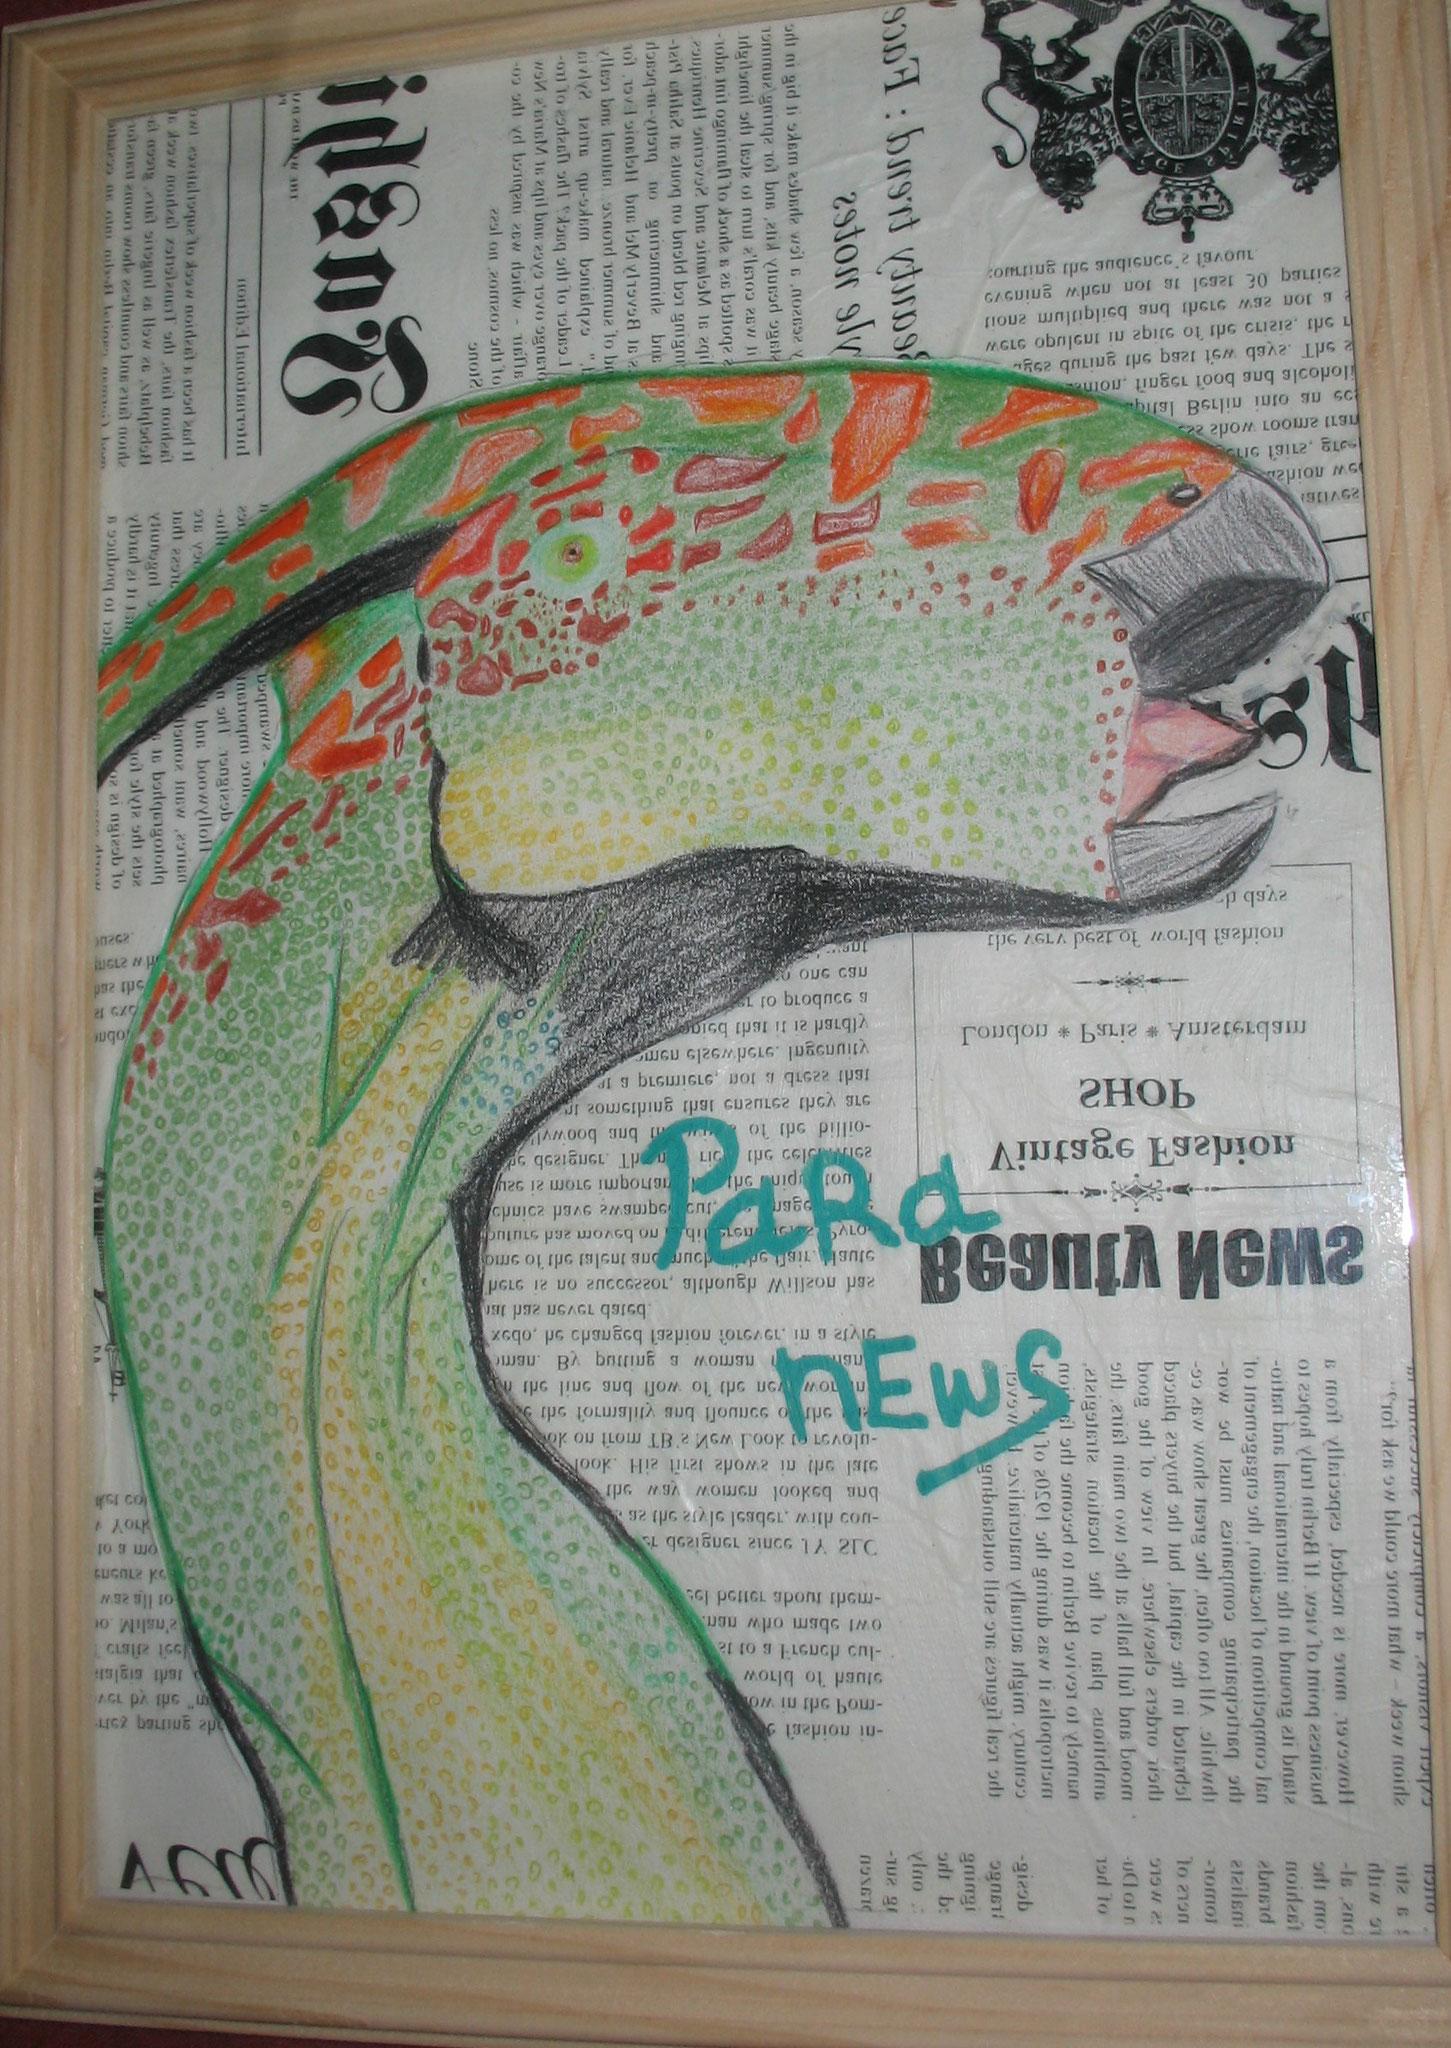 Para News (Collage: Aquarellstifte auf Decoupage)